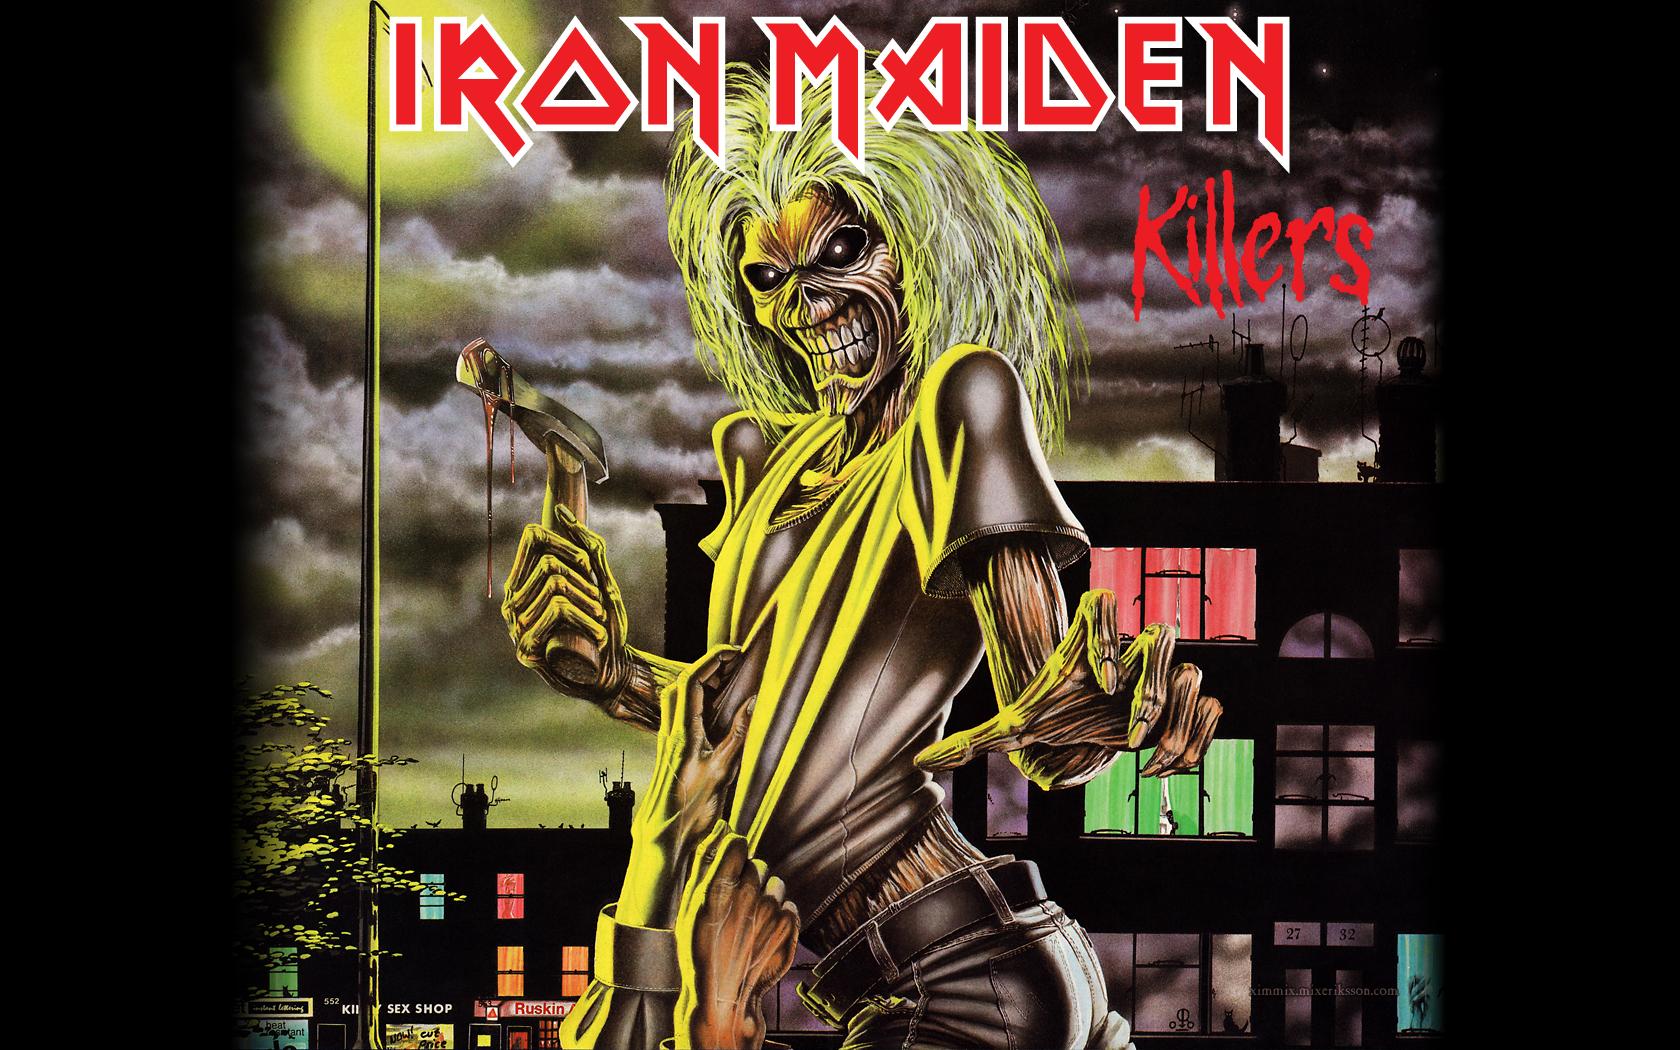 Iron Maiden remastered 1680x1050